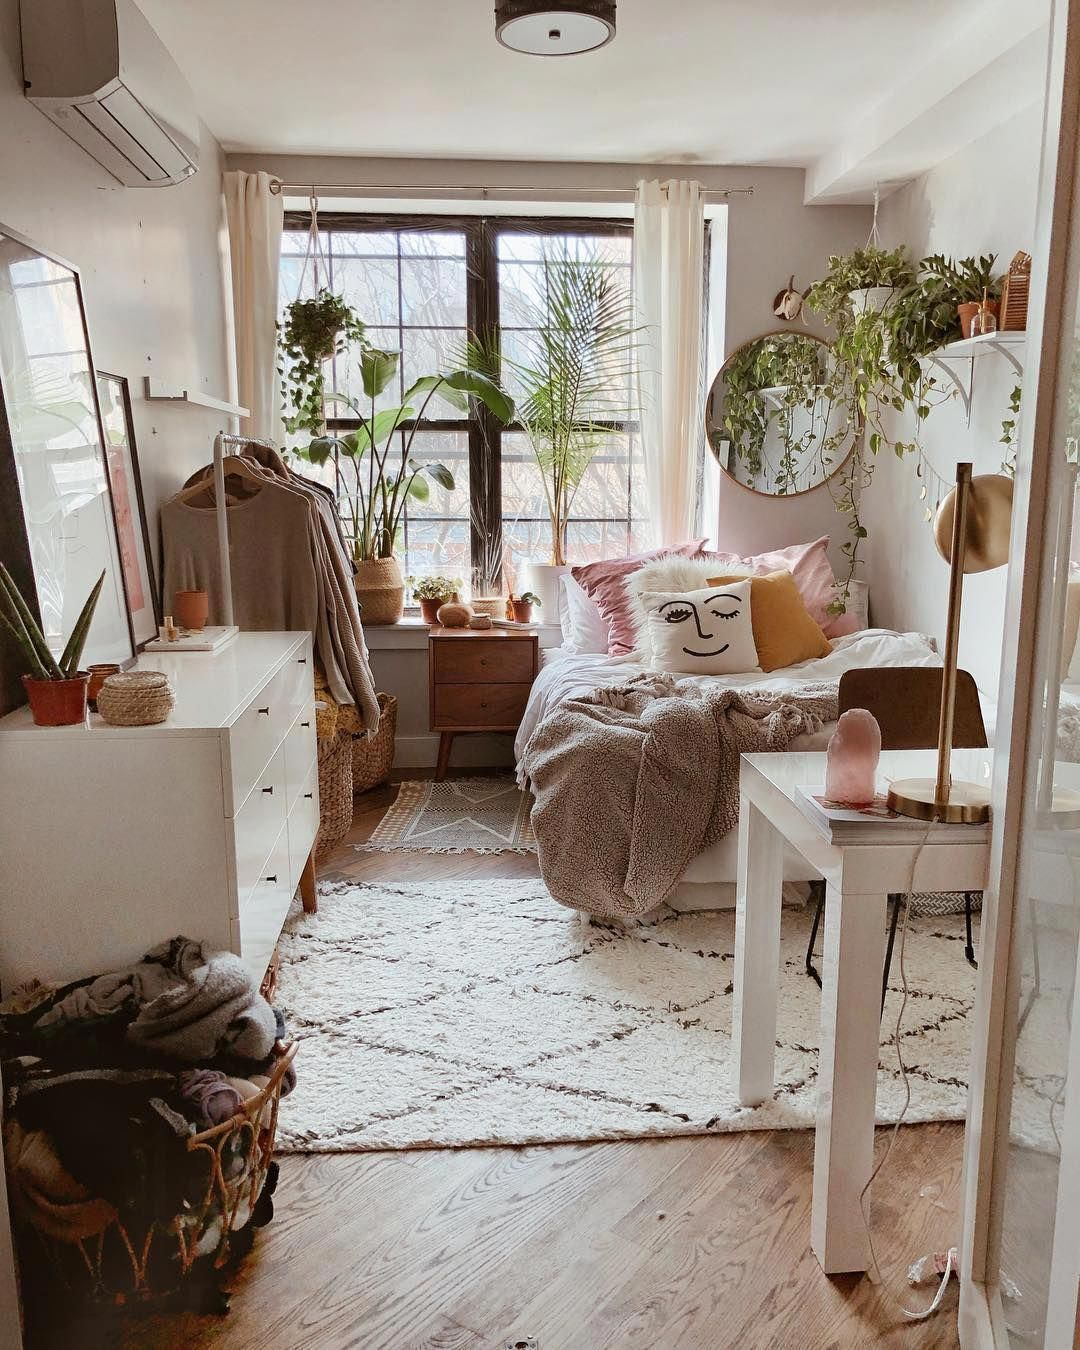 58 Small Scandinavian Bedroom Ideas In 2020 With Images Dorm Room Decor Cozy Dorm Room Aesthetic Room Decor